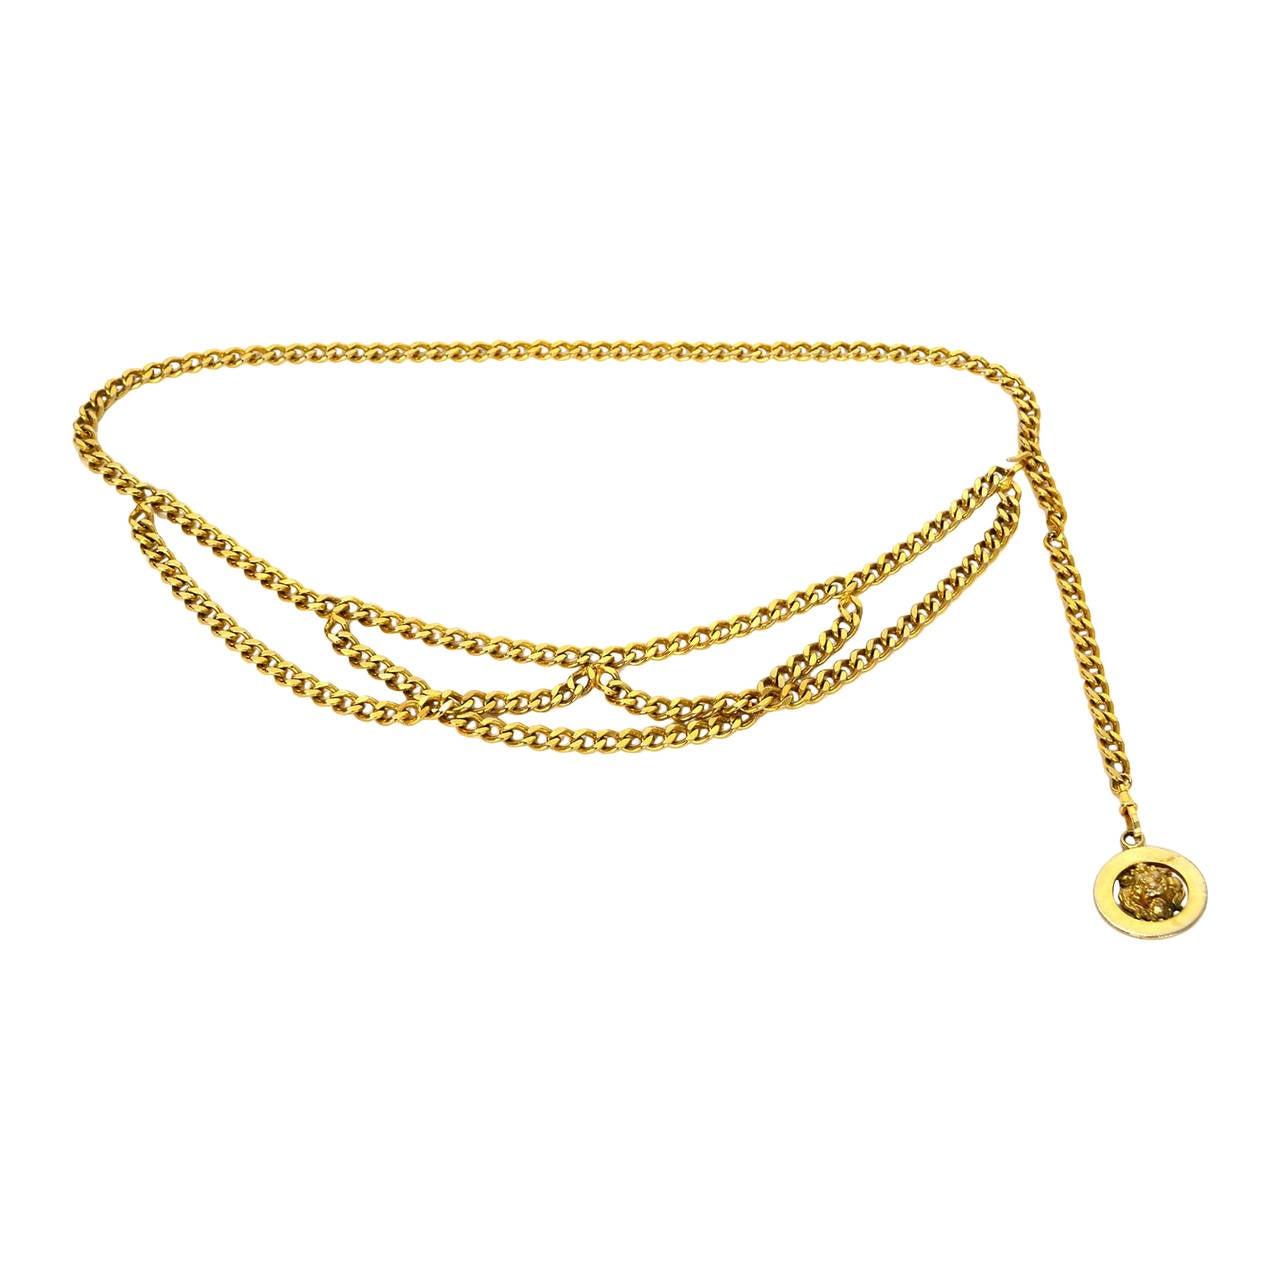 CHANEL Vintage '50s-'60s Gold Three Tier Chain Link Belt